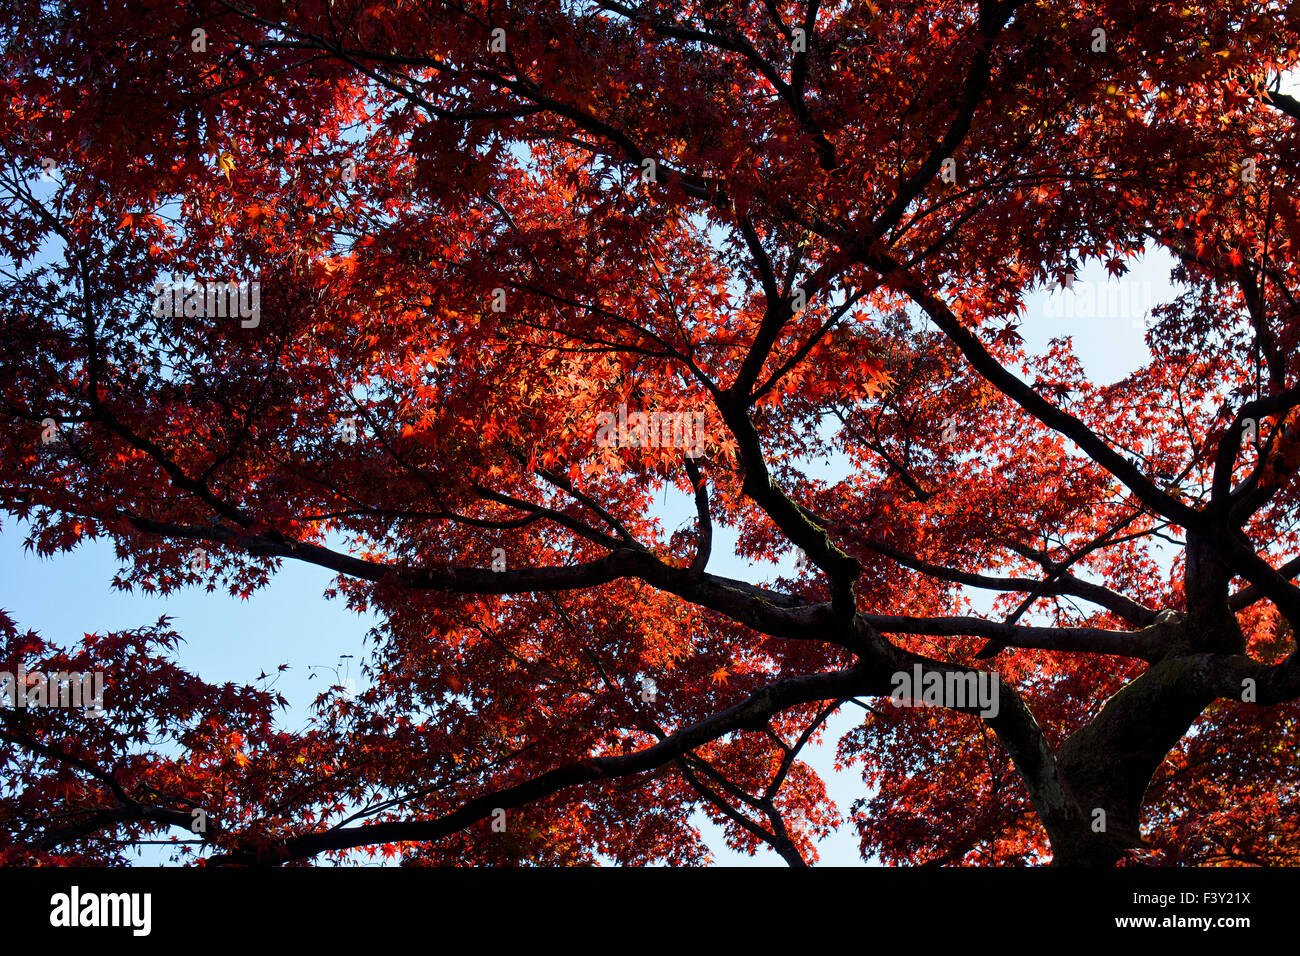 Japan, Honshu island, Kansai, Kyoto, maple in autumn. Stock Photo